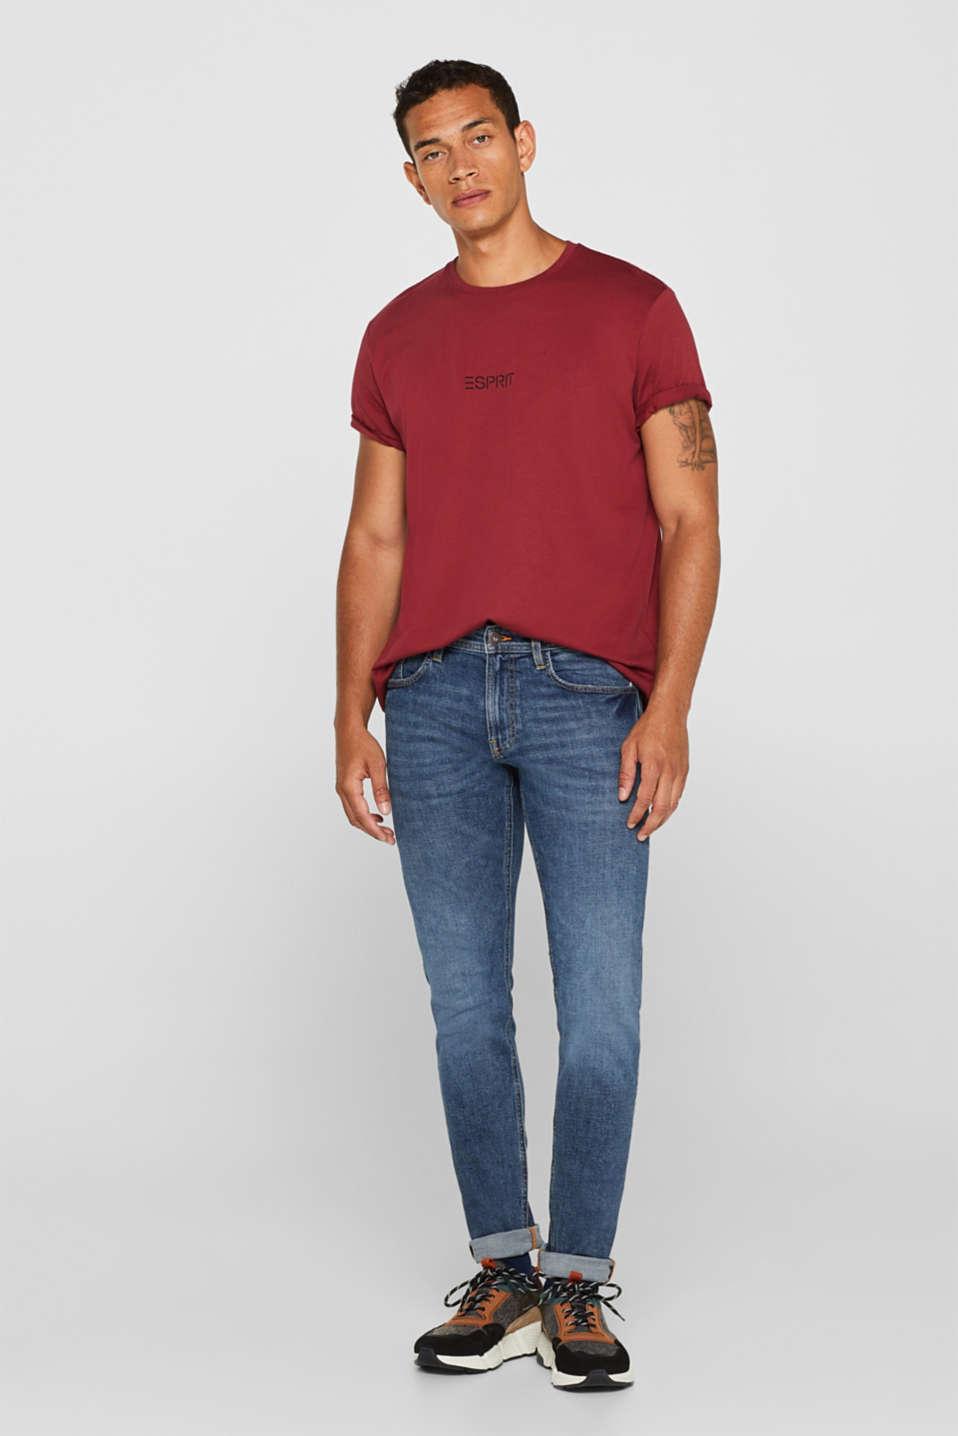 Jersey logo T-shirt, 100% cotton, BORDEAUX RED, detail image number 4